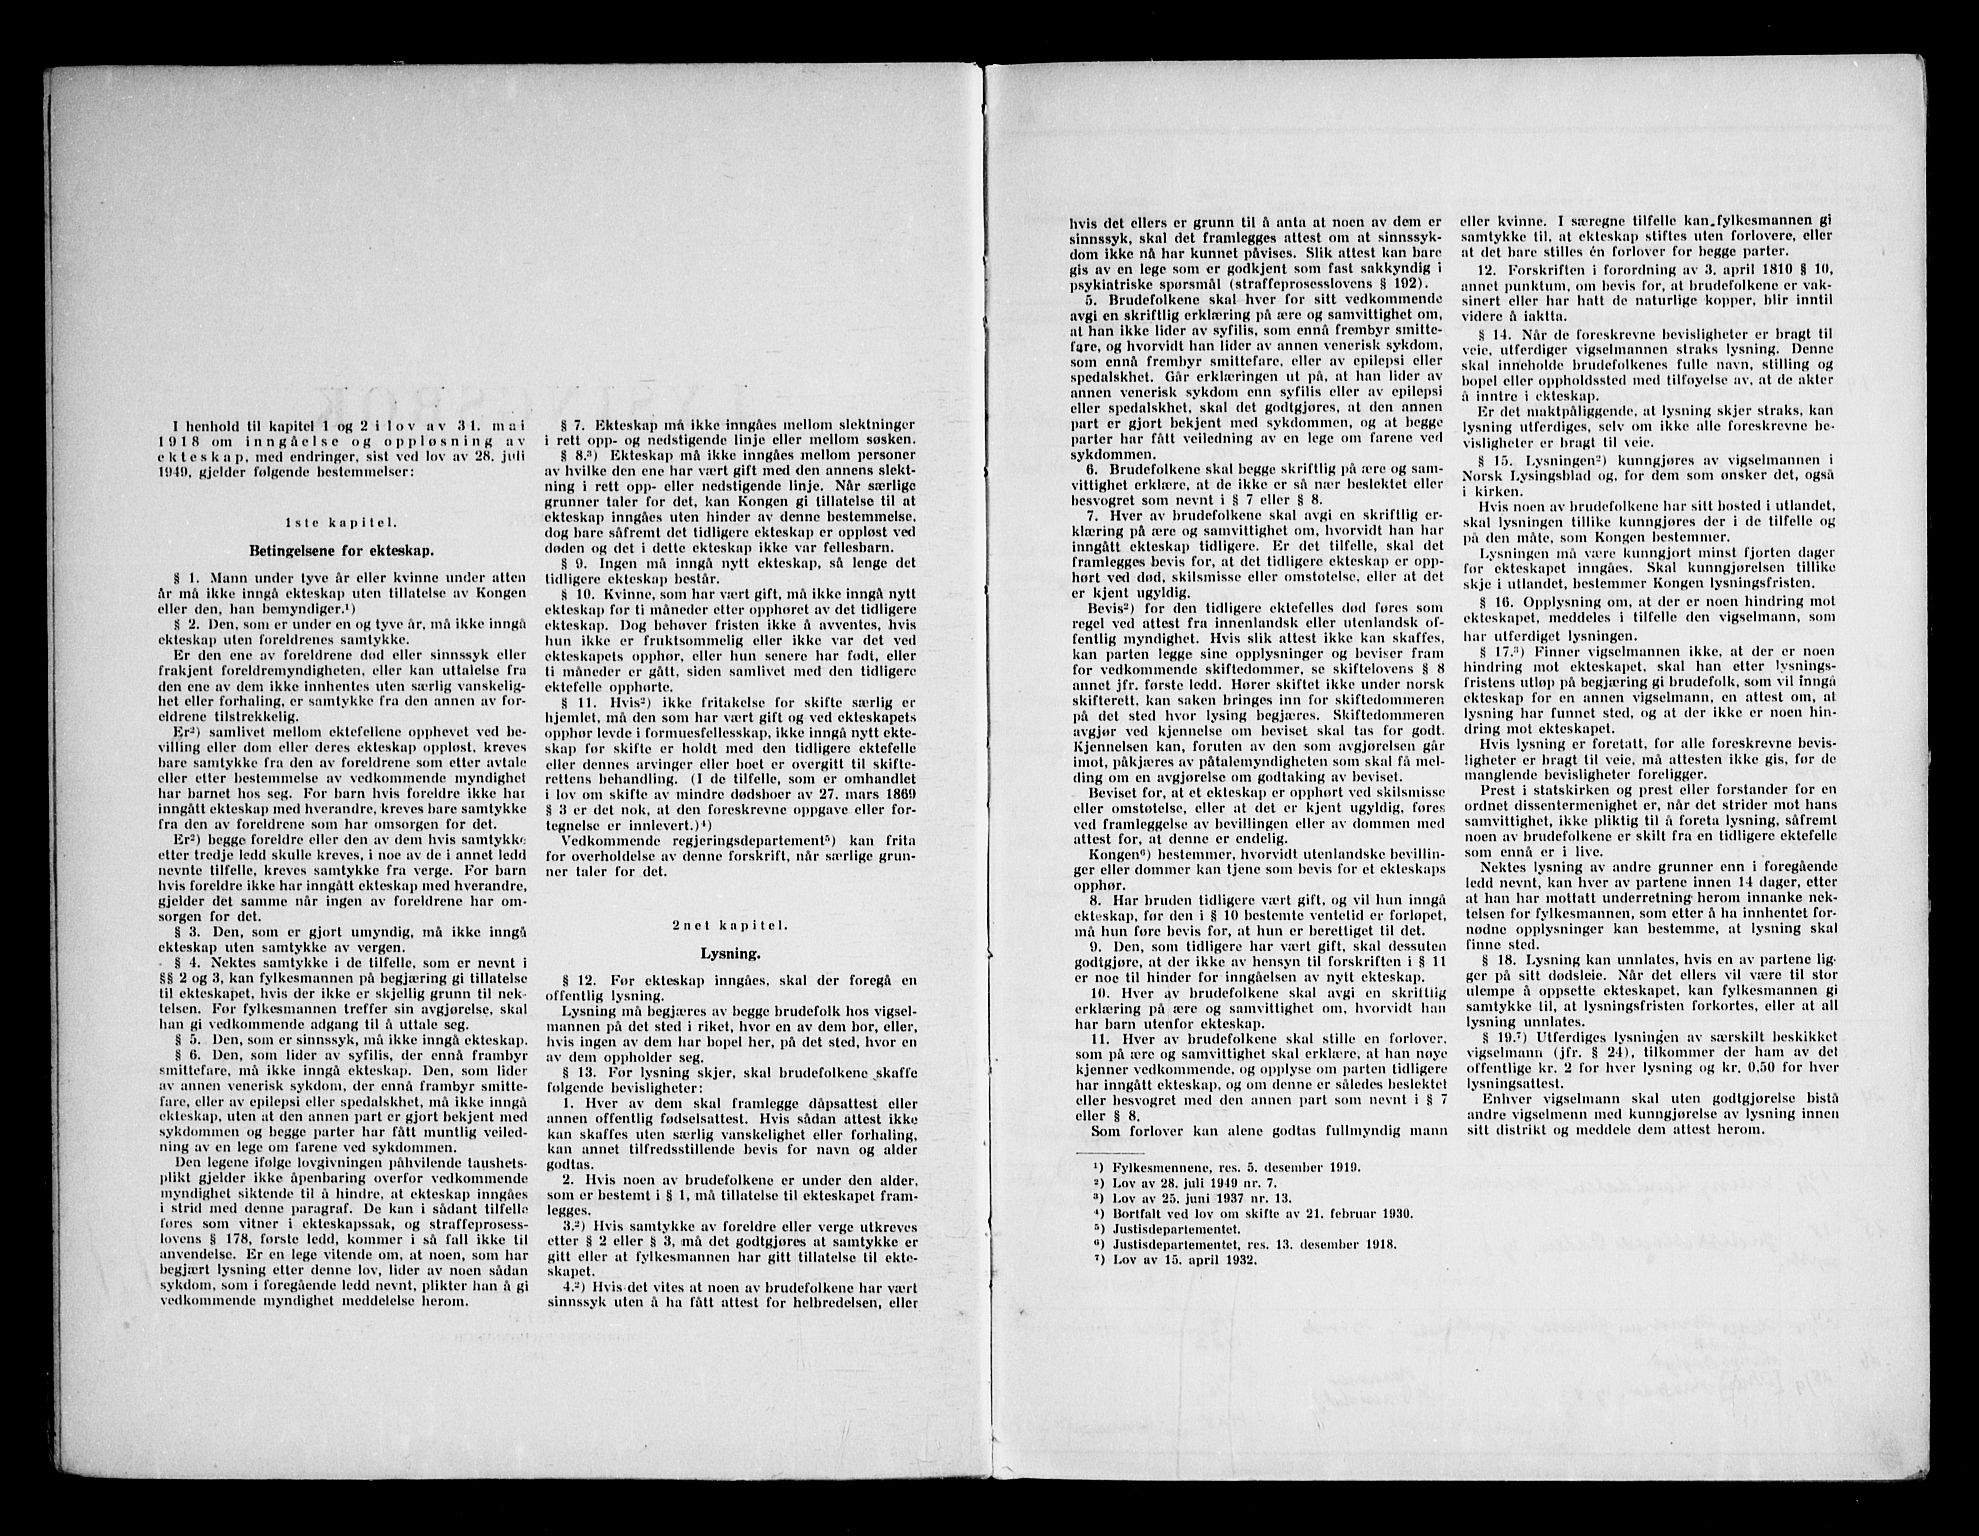 SAKO, Holla kirkebøker, H/Ha/L0002: Lysningsprotokoll nr. 2, 1951-1969